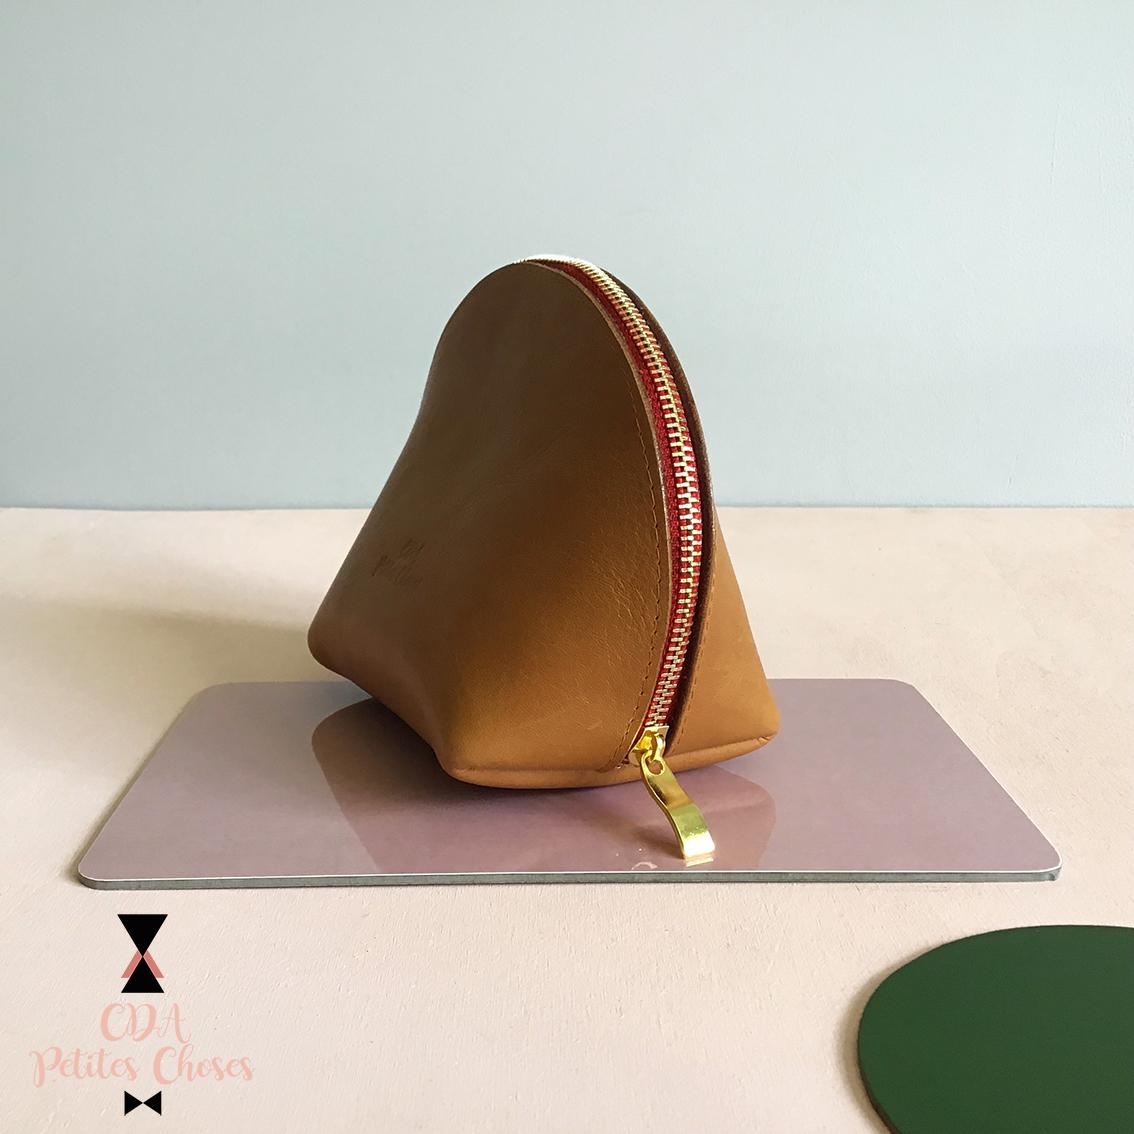 Trousse coquille en cuir CDA Petites Choses